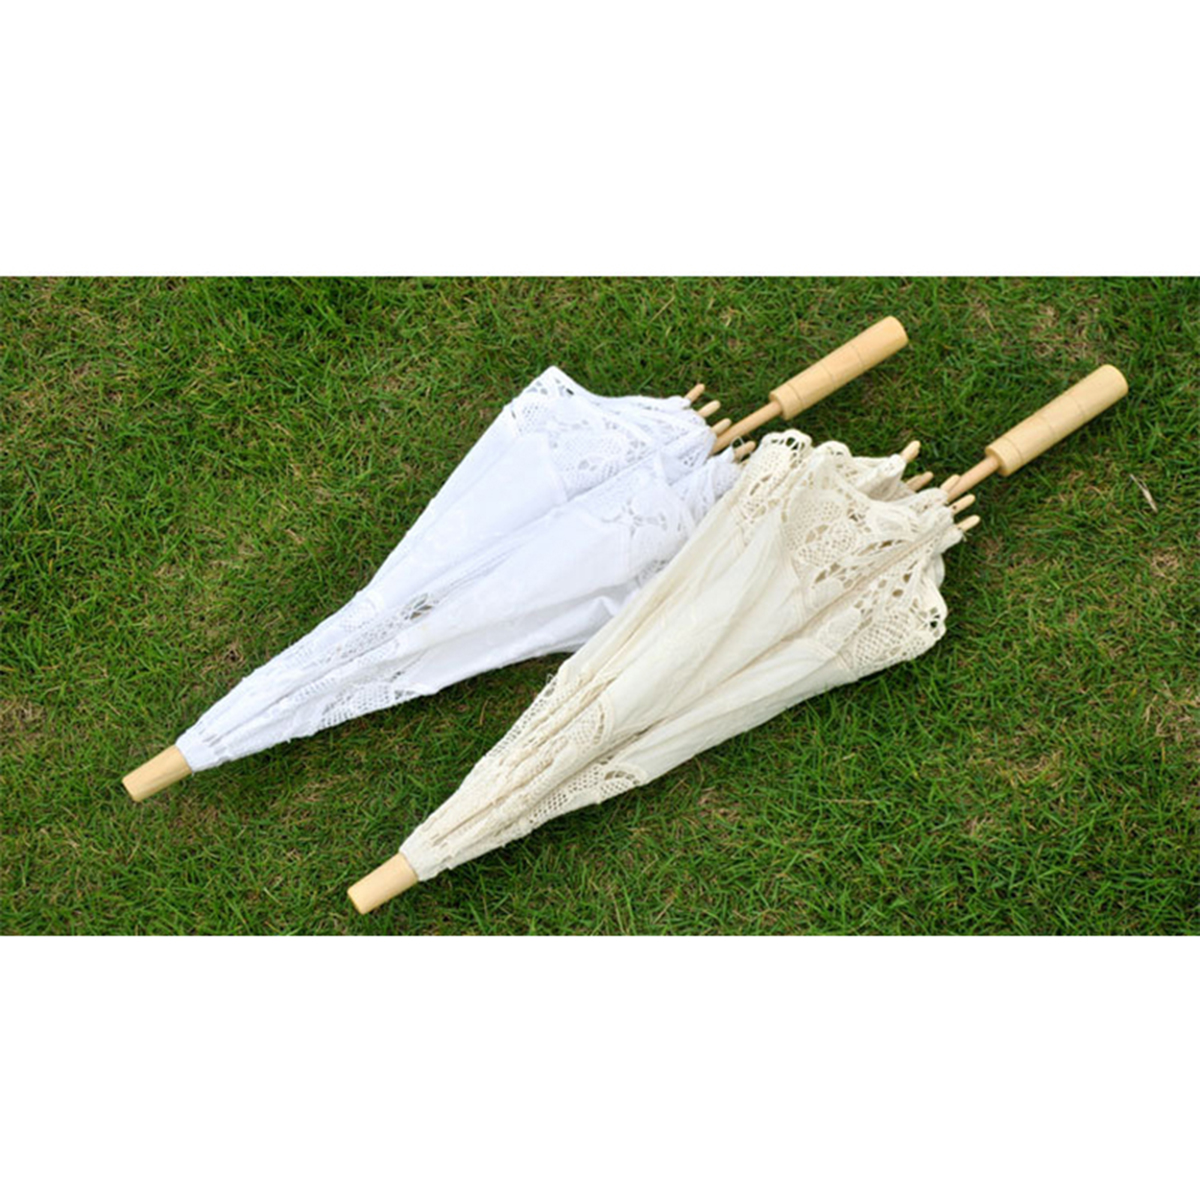 Image 5 - Bridal Wedding Umbrella Lace Cotton Embroidery Handmade Parasol Umbrella For Wedding Romantic Photo Props L Size 60cmBridal Umbrellas   -